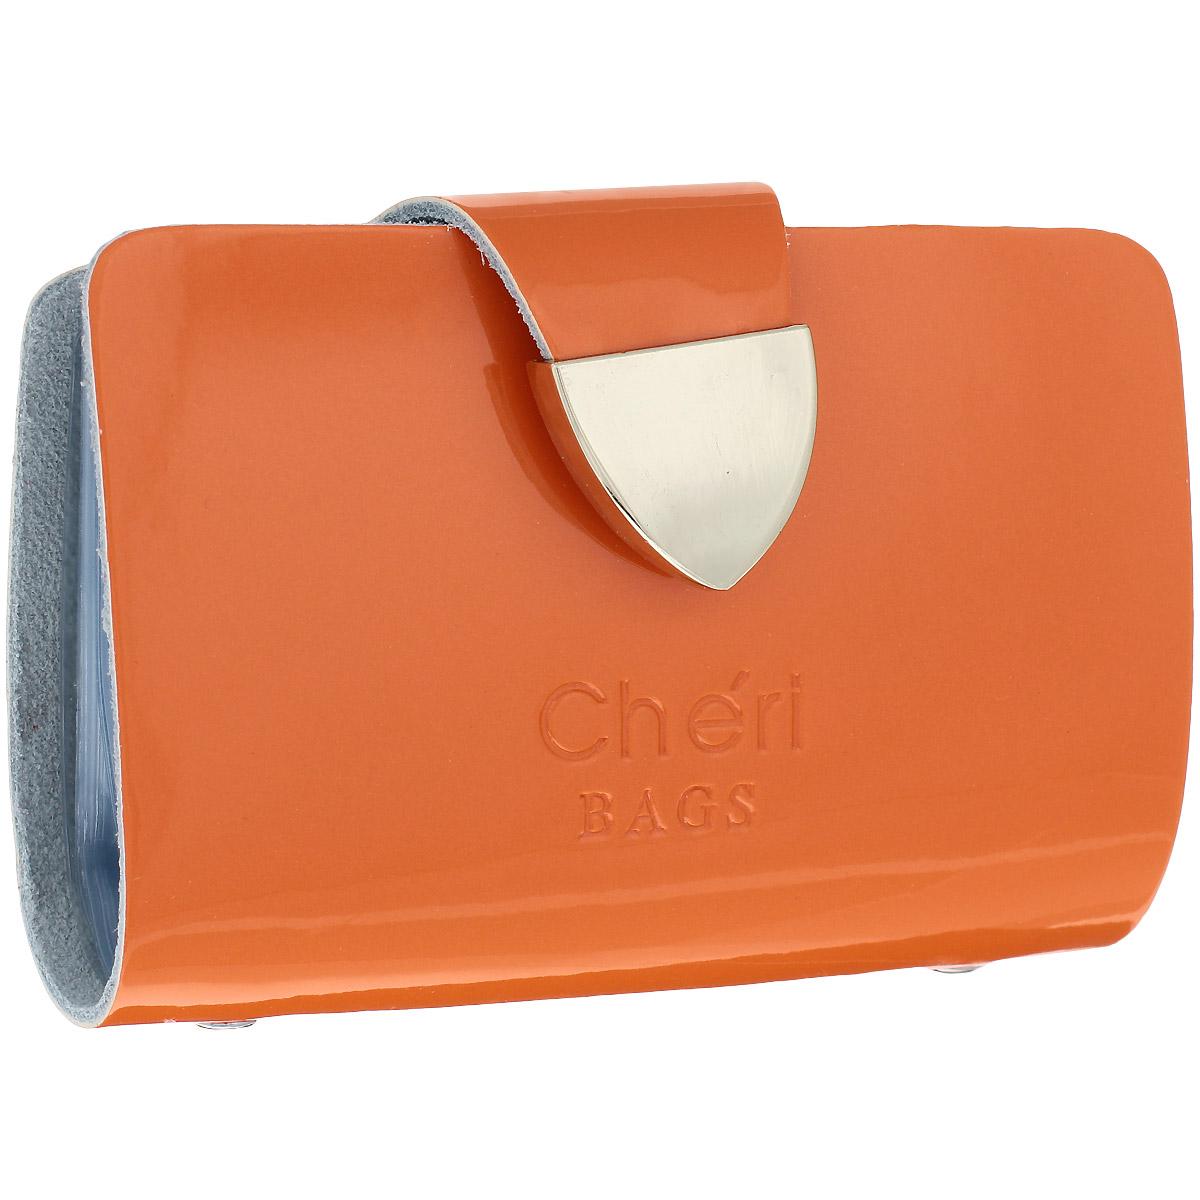 Визитница Cheribags, цвет: оранжевый. V-0482-22